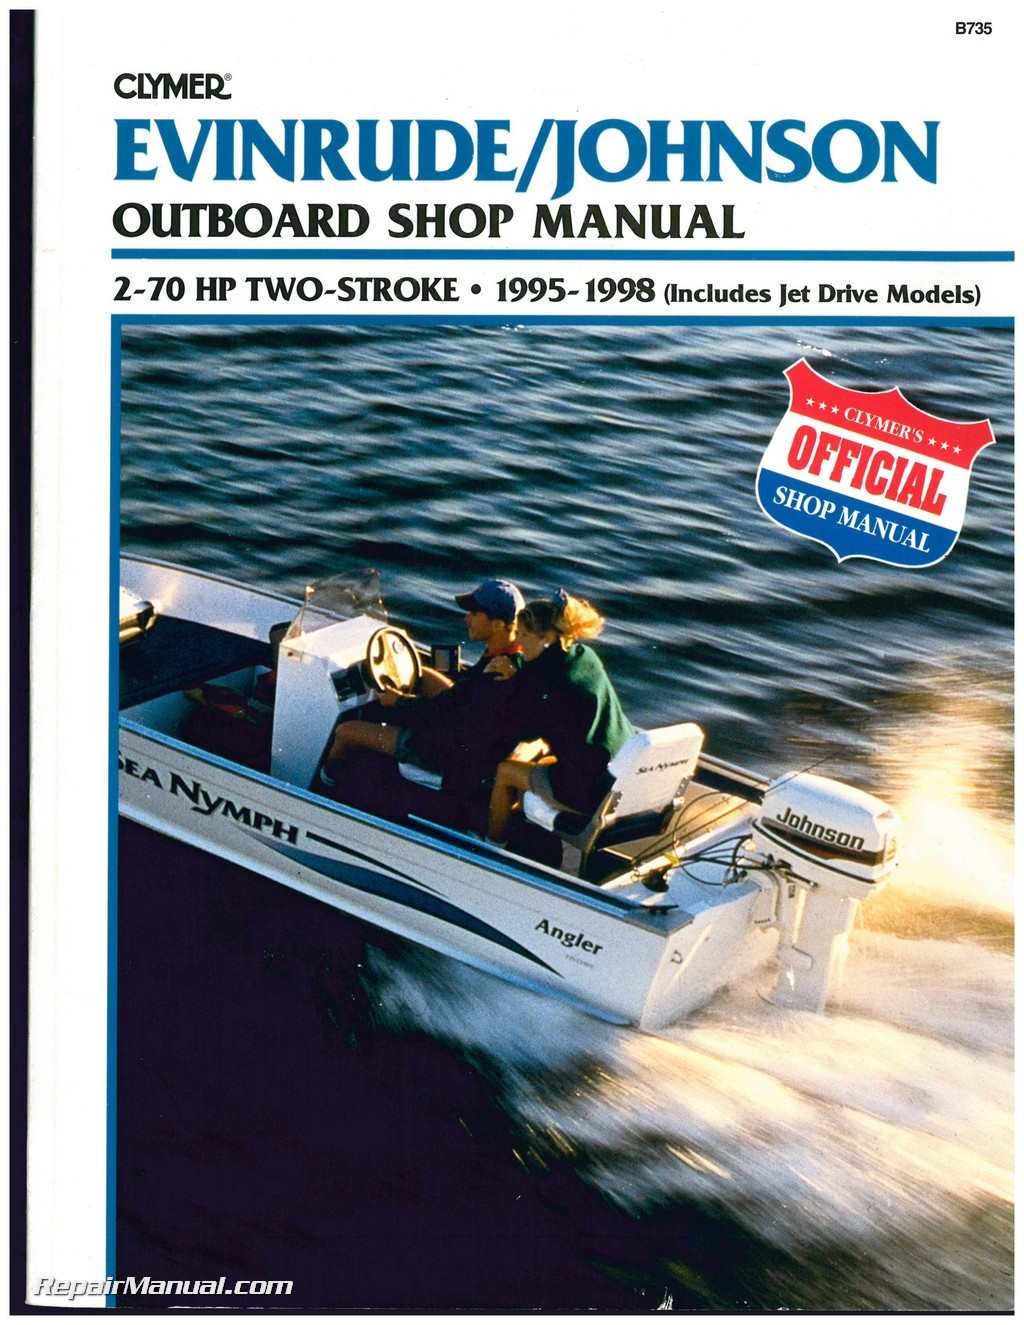 Johnson Diagram Wiring 55hp 55fs69kadiagram Pump Evinrude 2 70 Hp Stroke Outboard Shop Manual 1995 1996 1997 19983resize